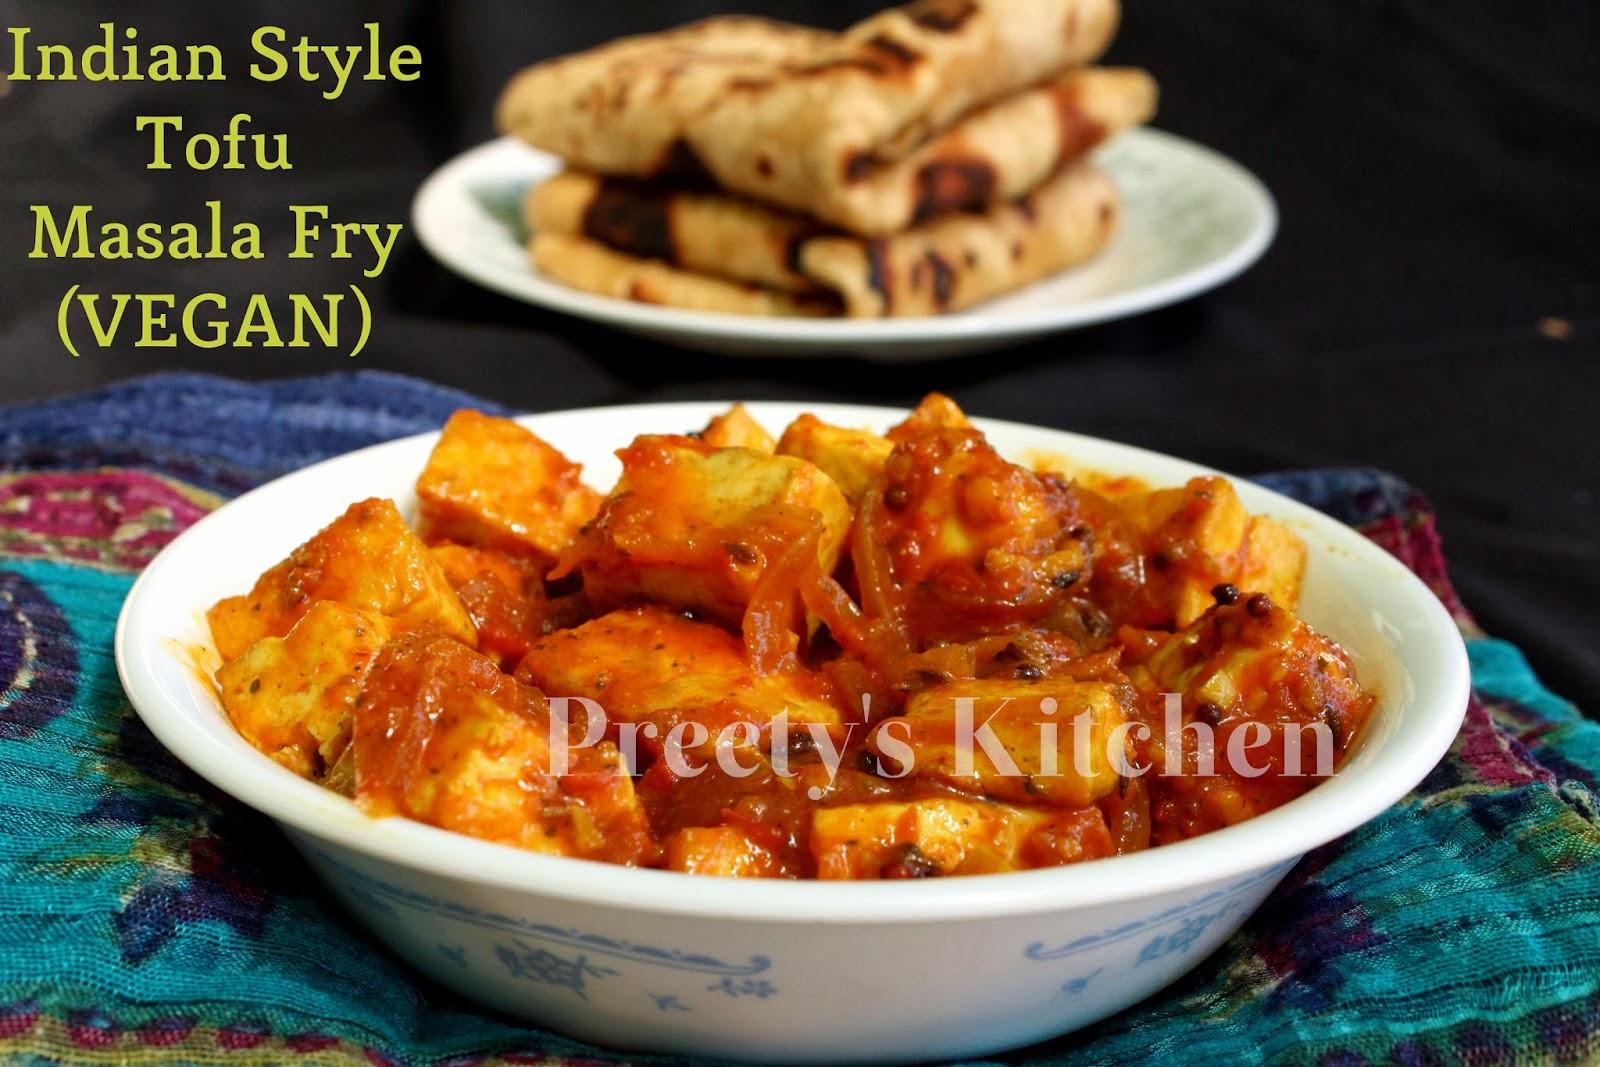 Indian Tofu Recipes  Preety s Kitchen Indian Style Tofu Masala Fry Vegan